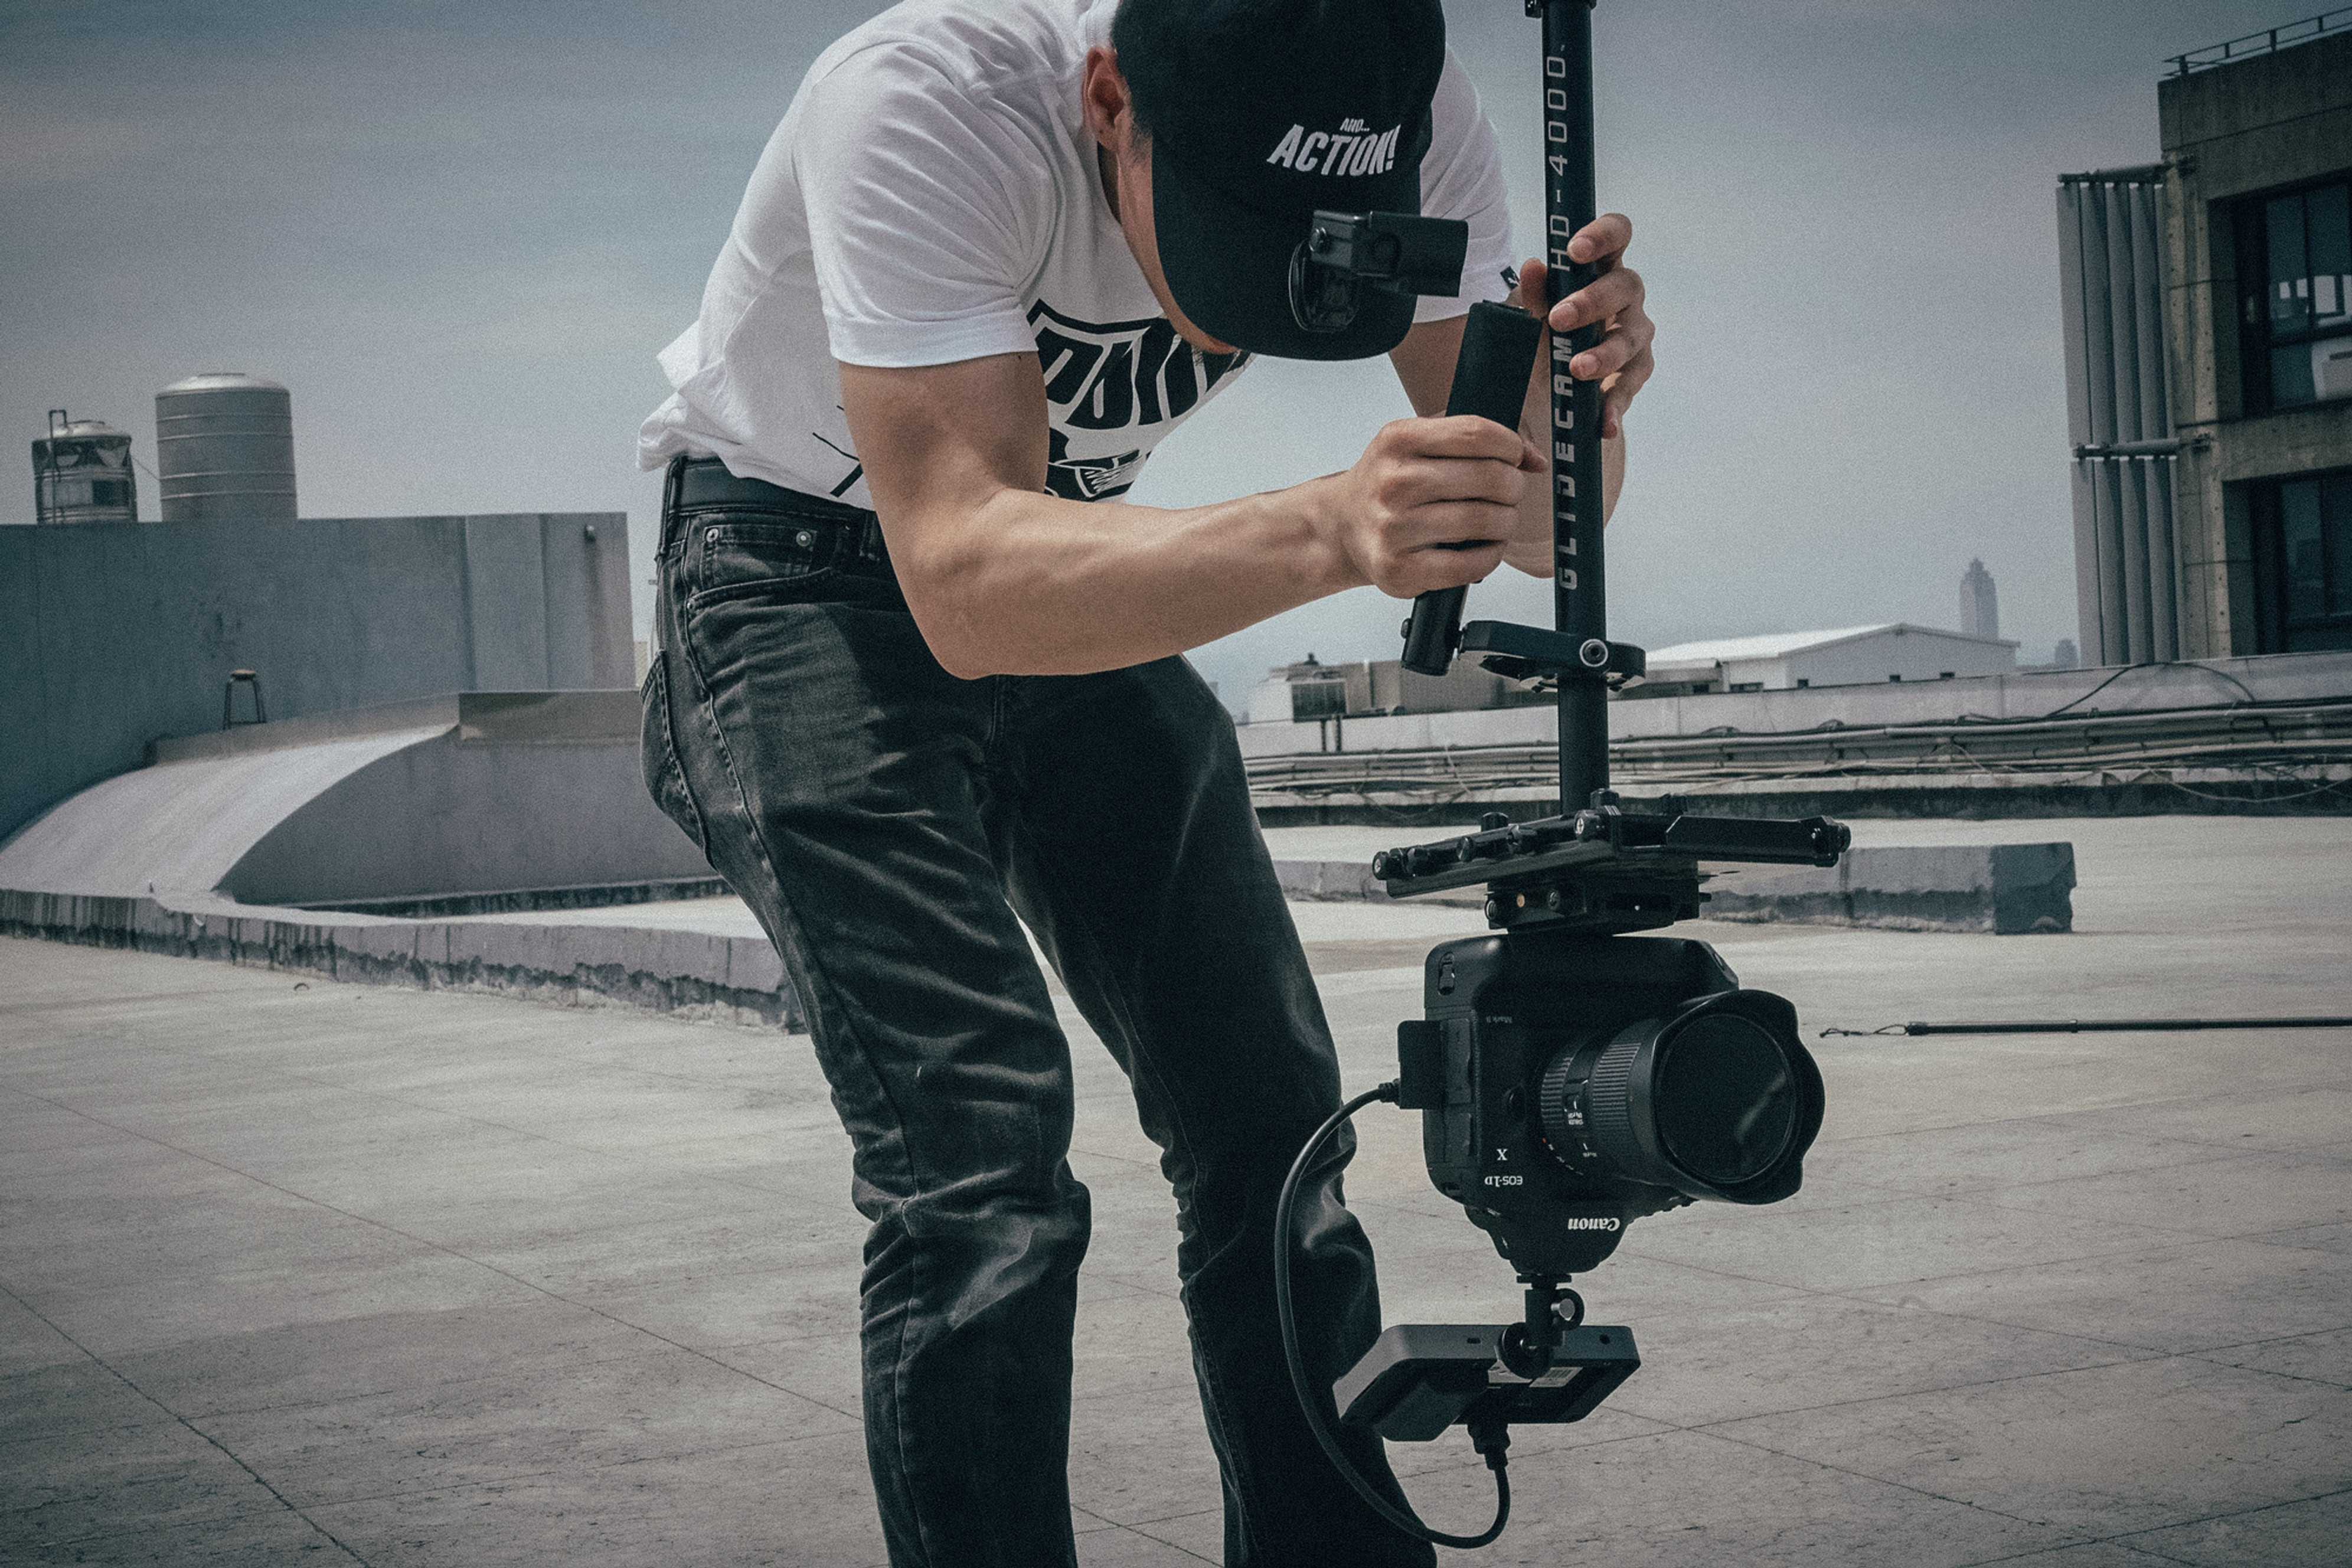 VIDEO COVERAGE + EDITING BUNDLE